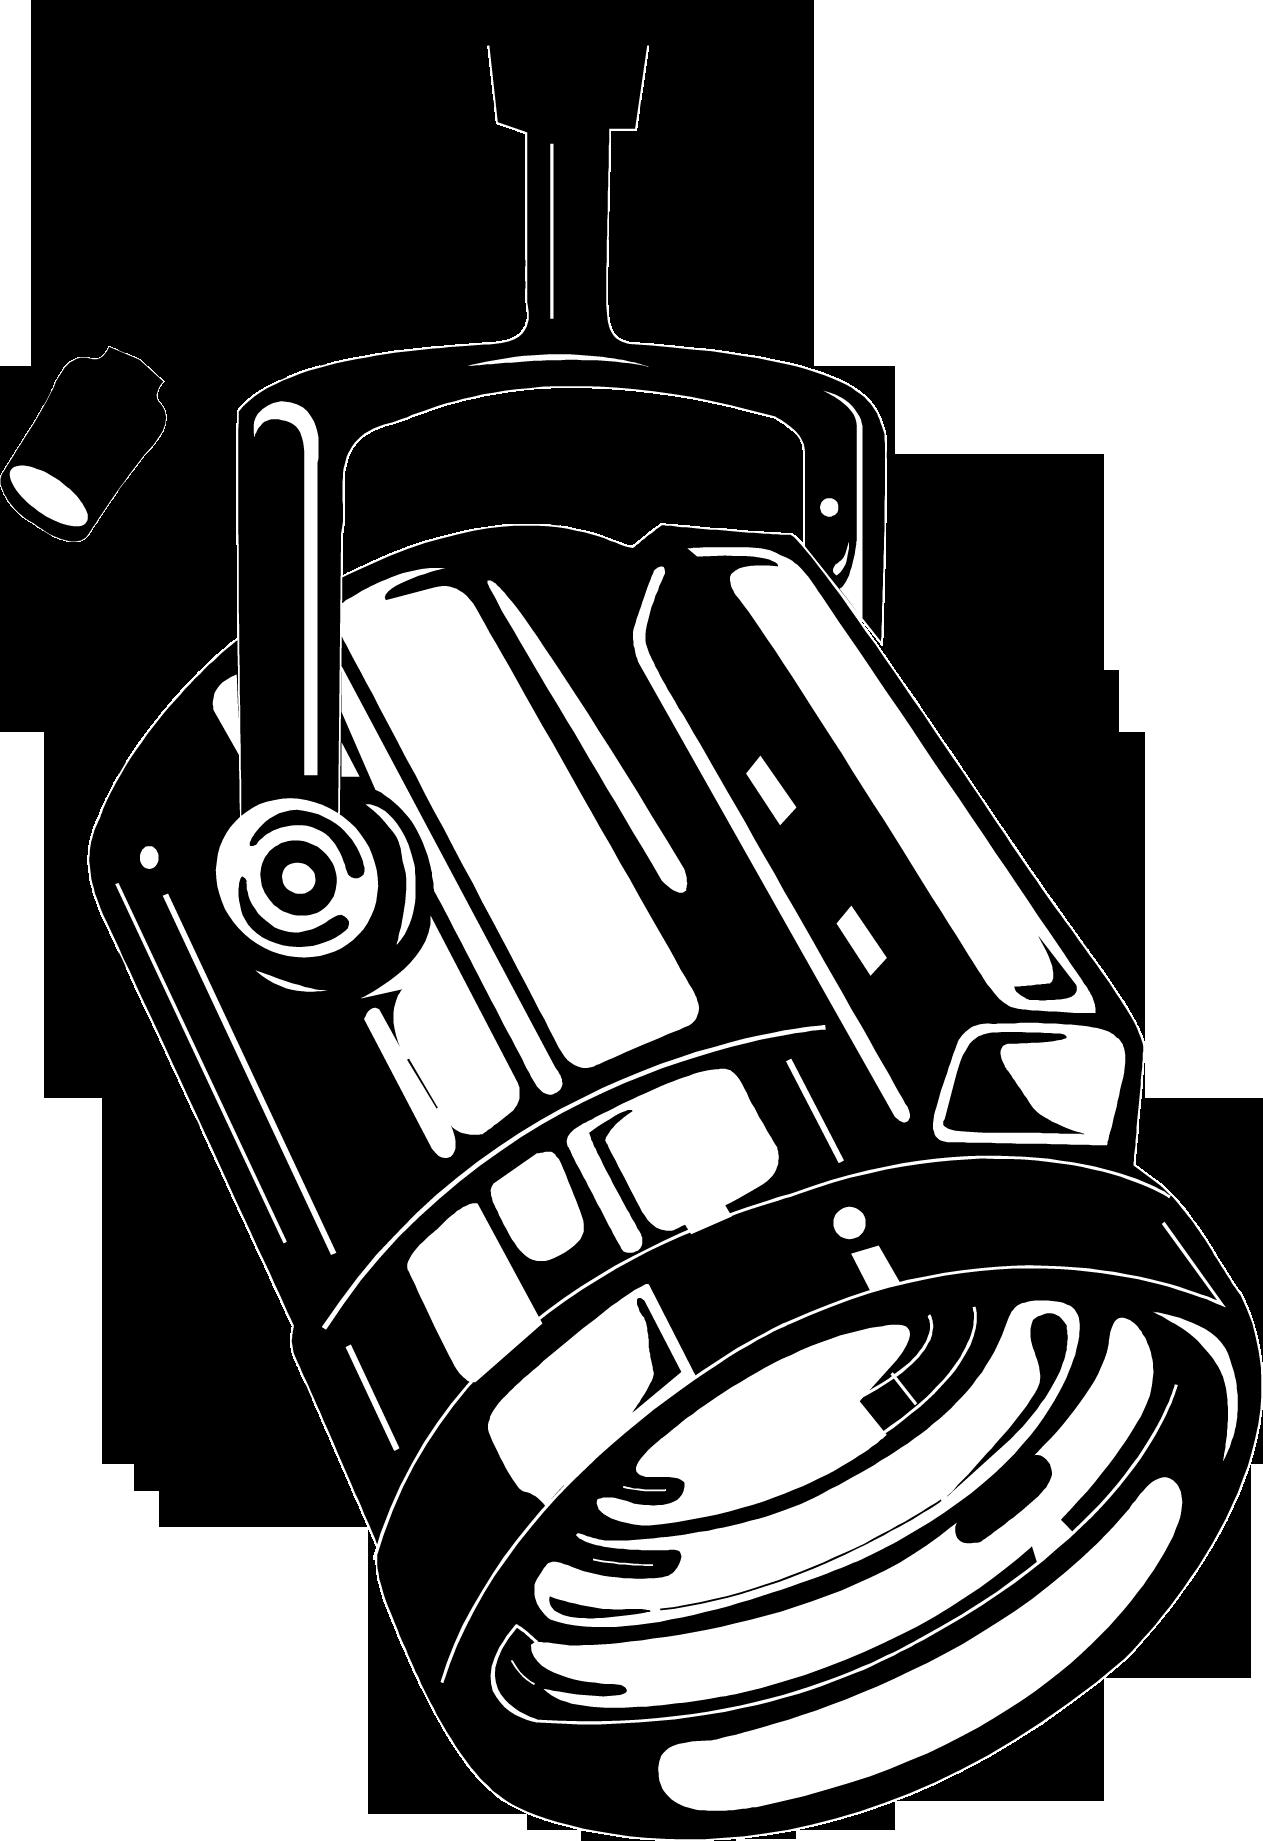 Lighting searchlight